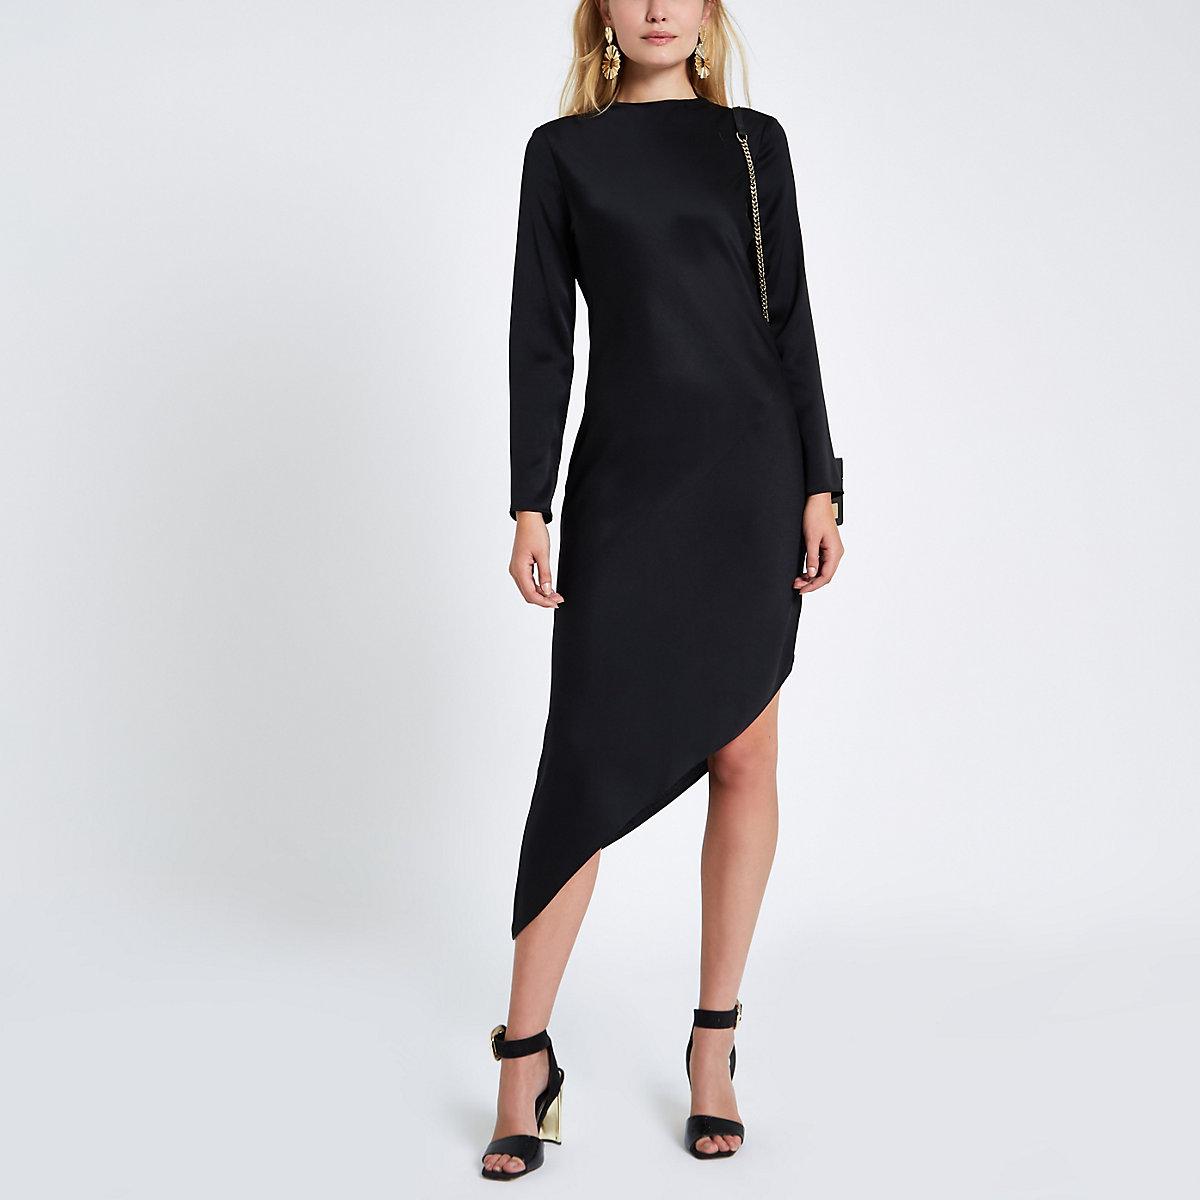 Zwarte asymmetrische jurk met lange mouwen